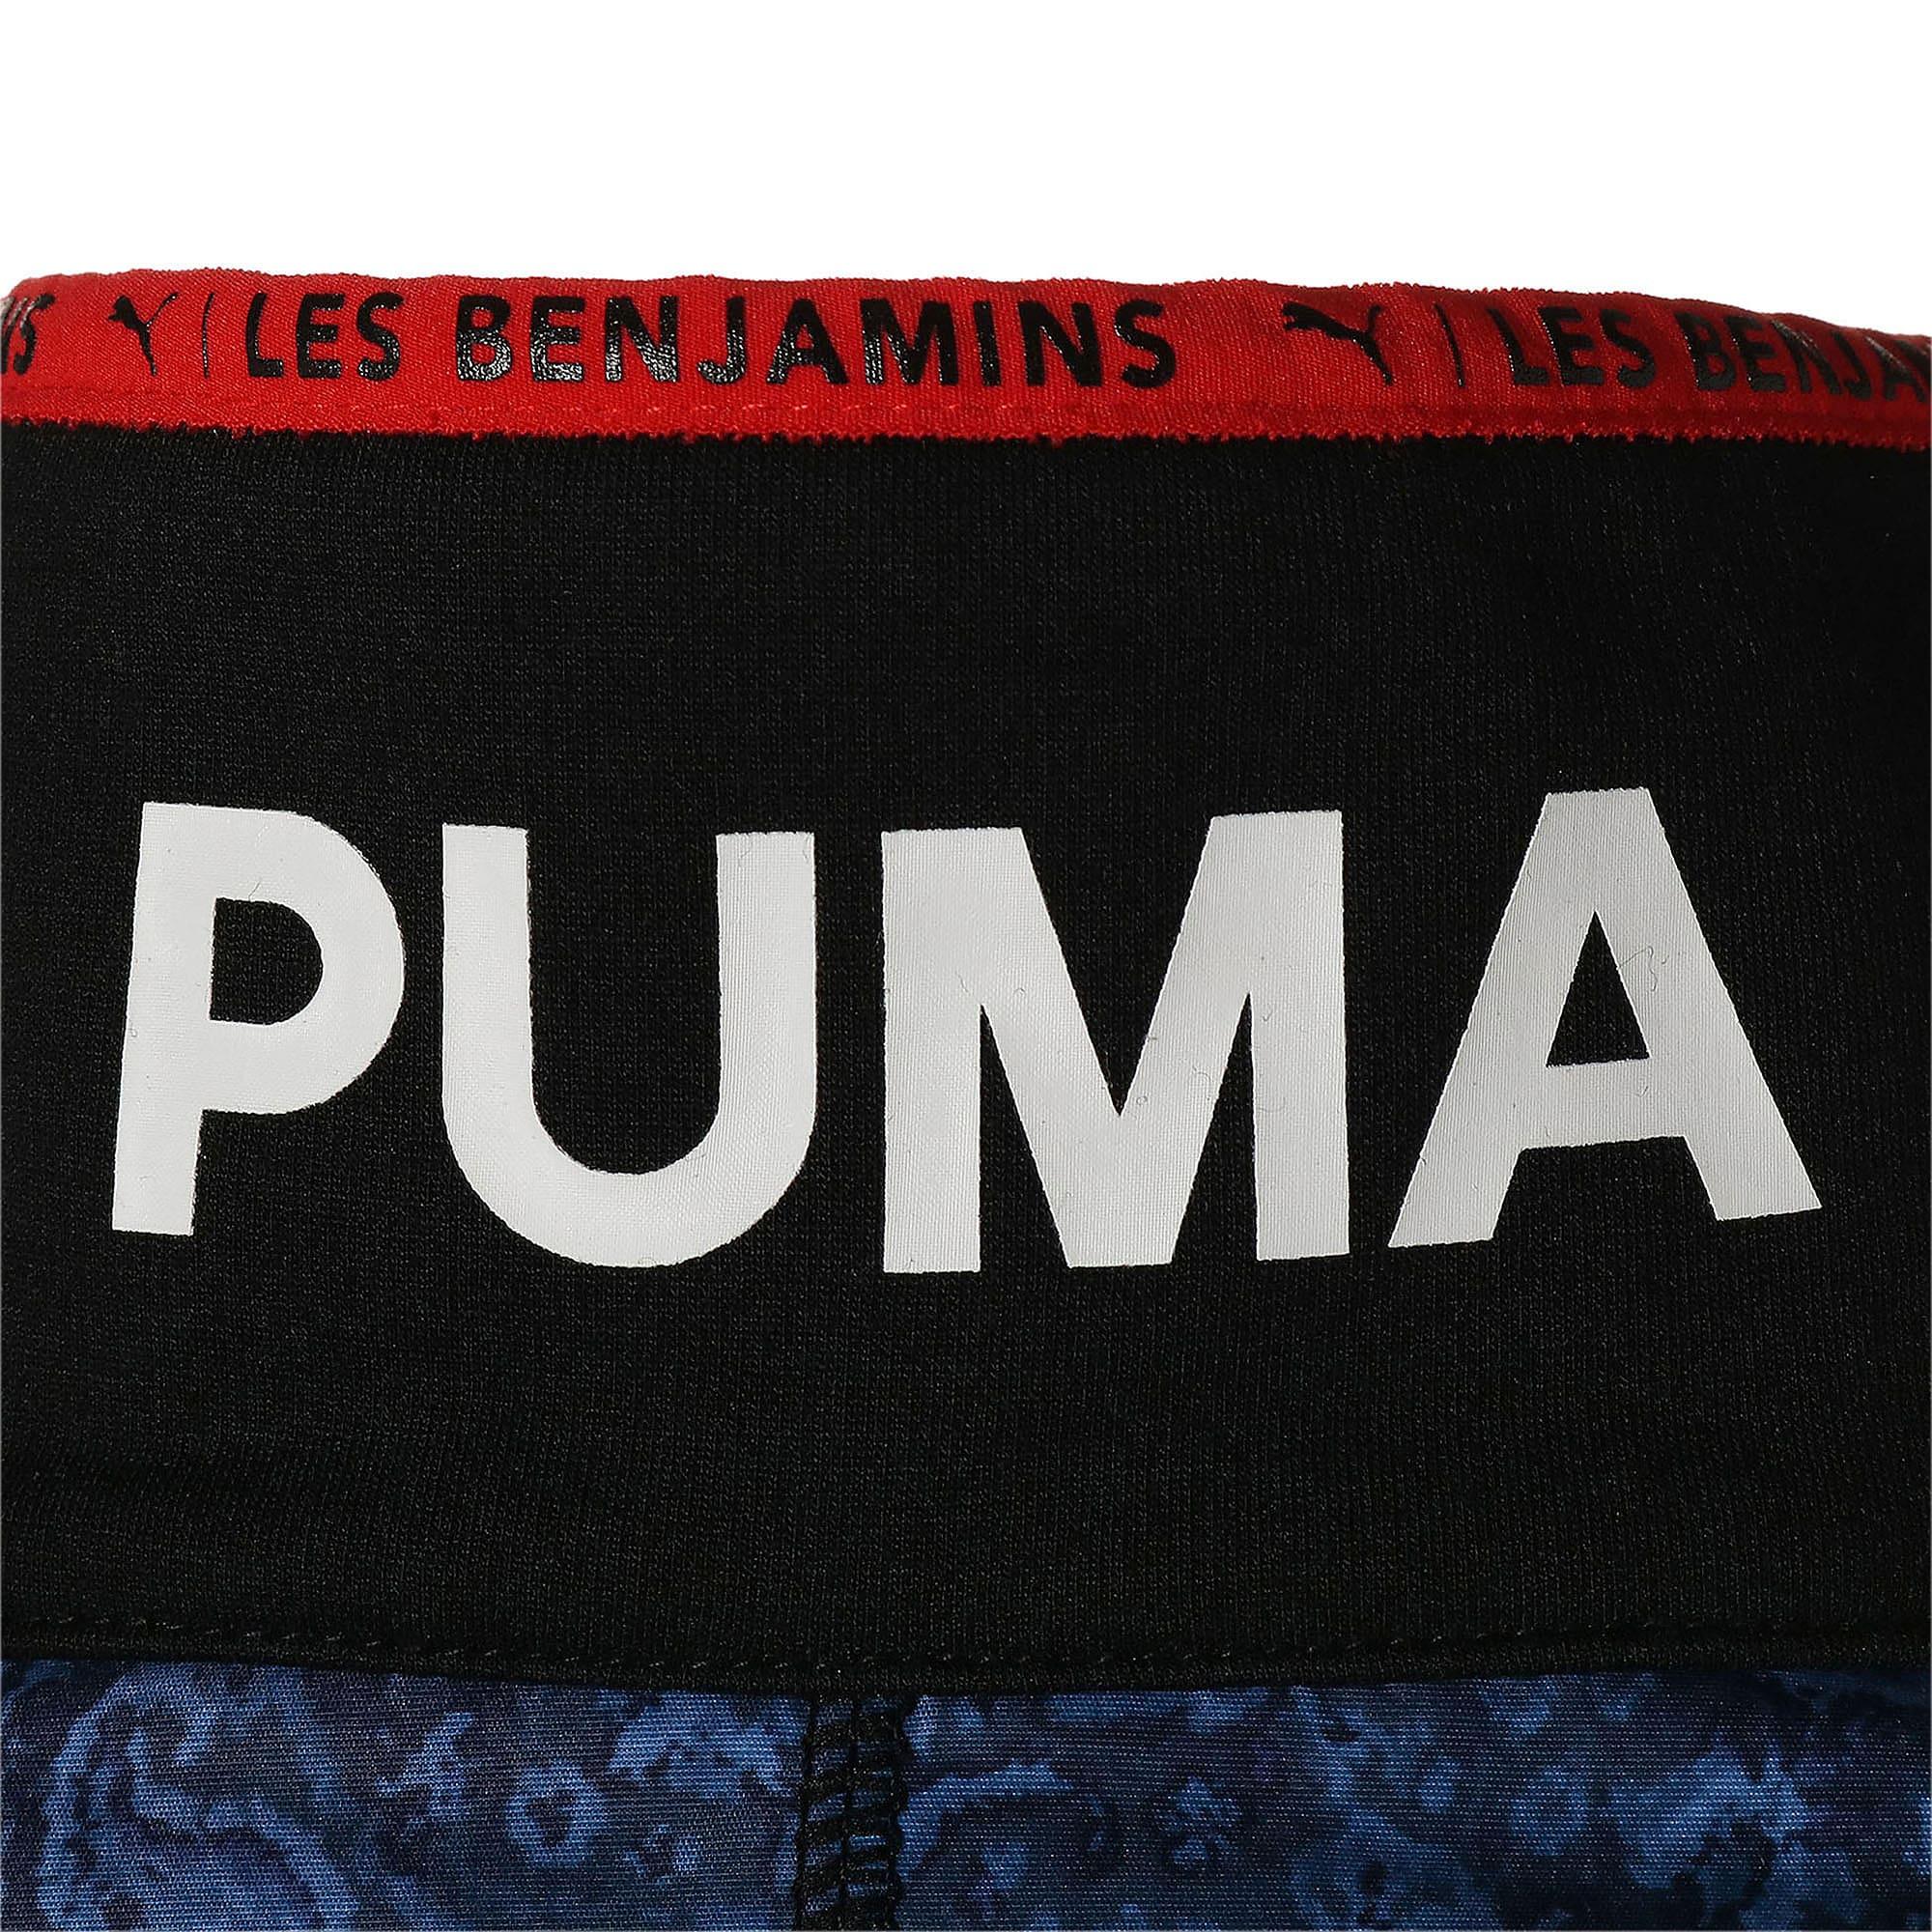 Thumbnail 11 of PUMA x LES BENJAMINS トラックジャケット, Puma White, medium-JPN